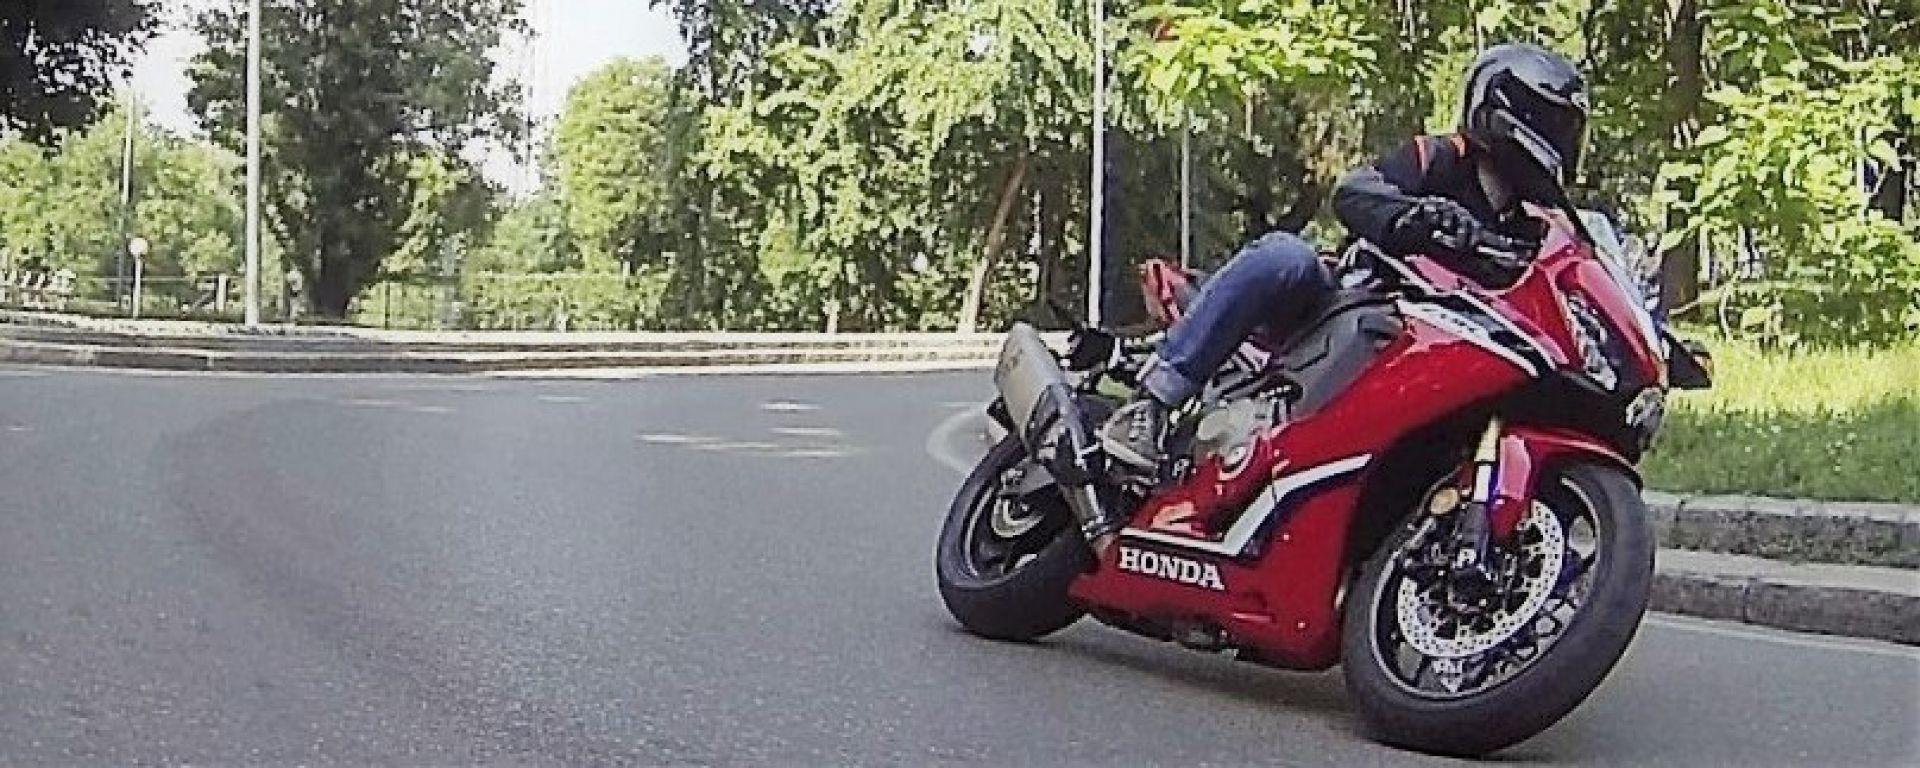 Honda CBR1000RR Fireblade 2018: la prova su strada